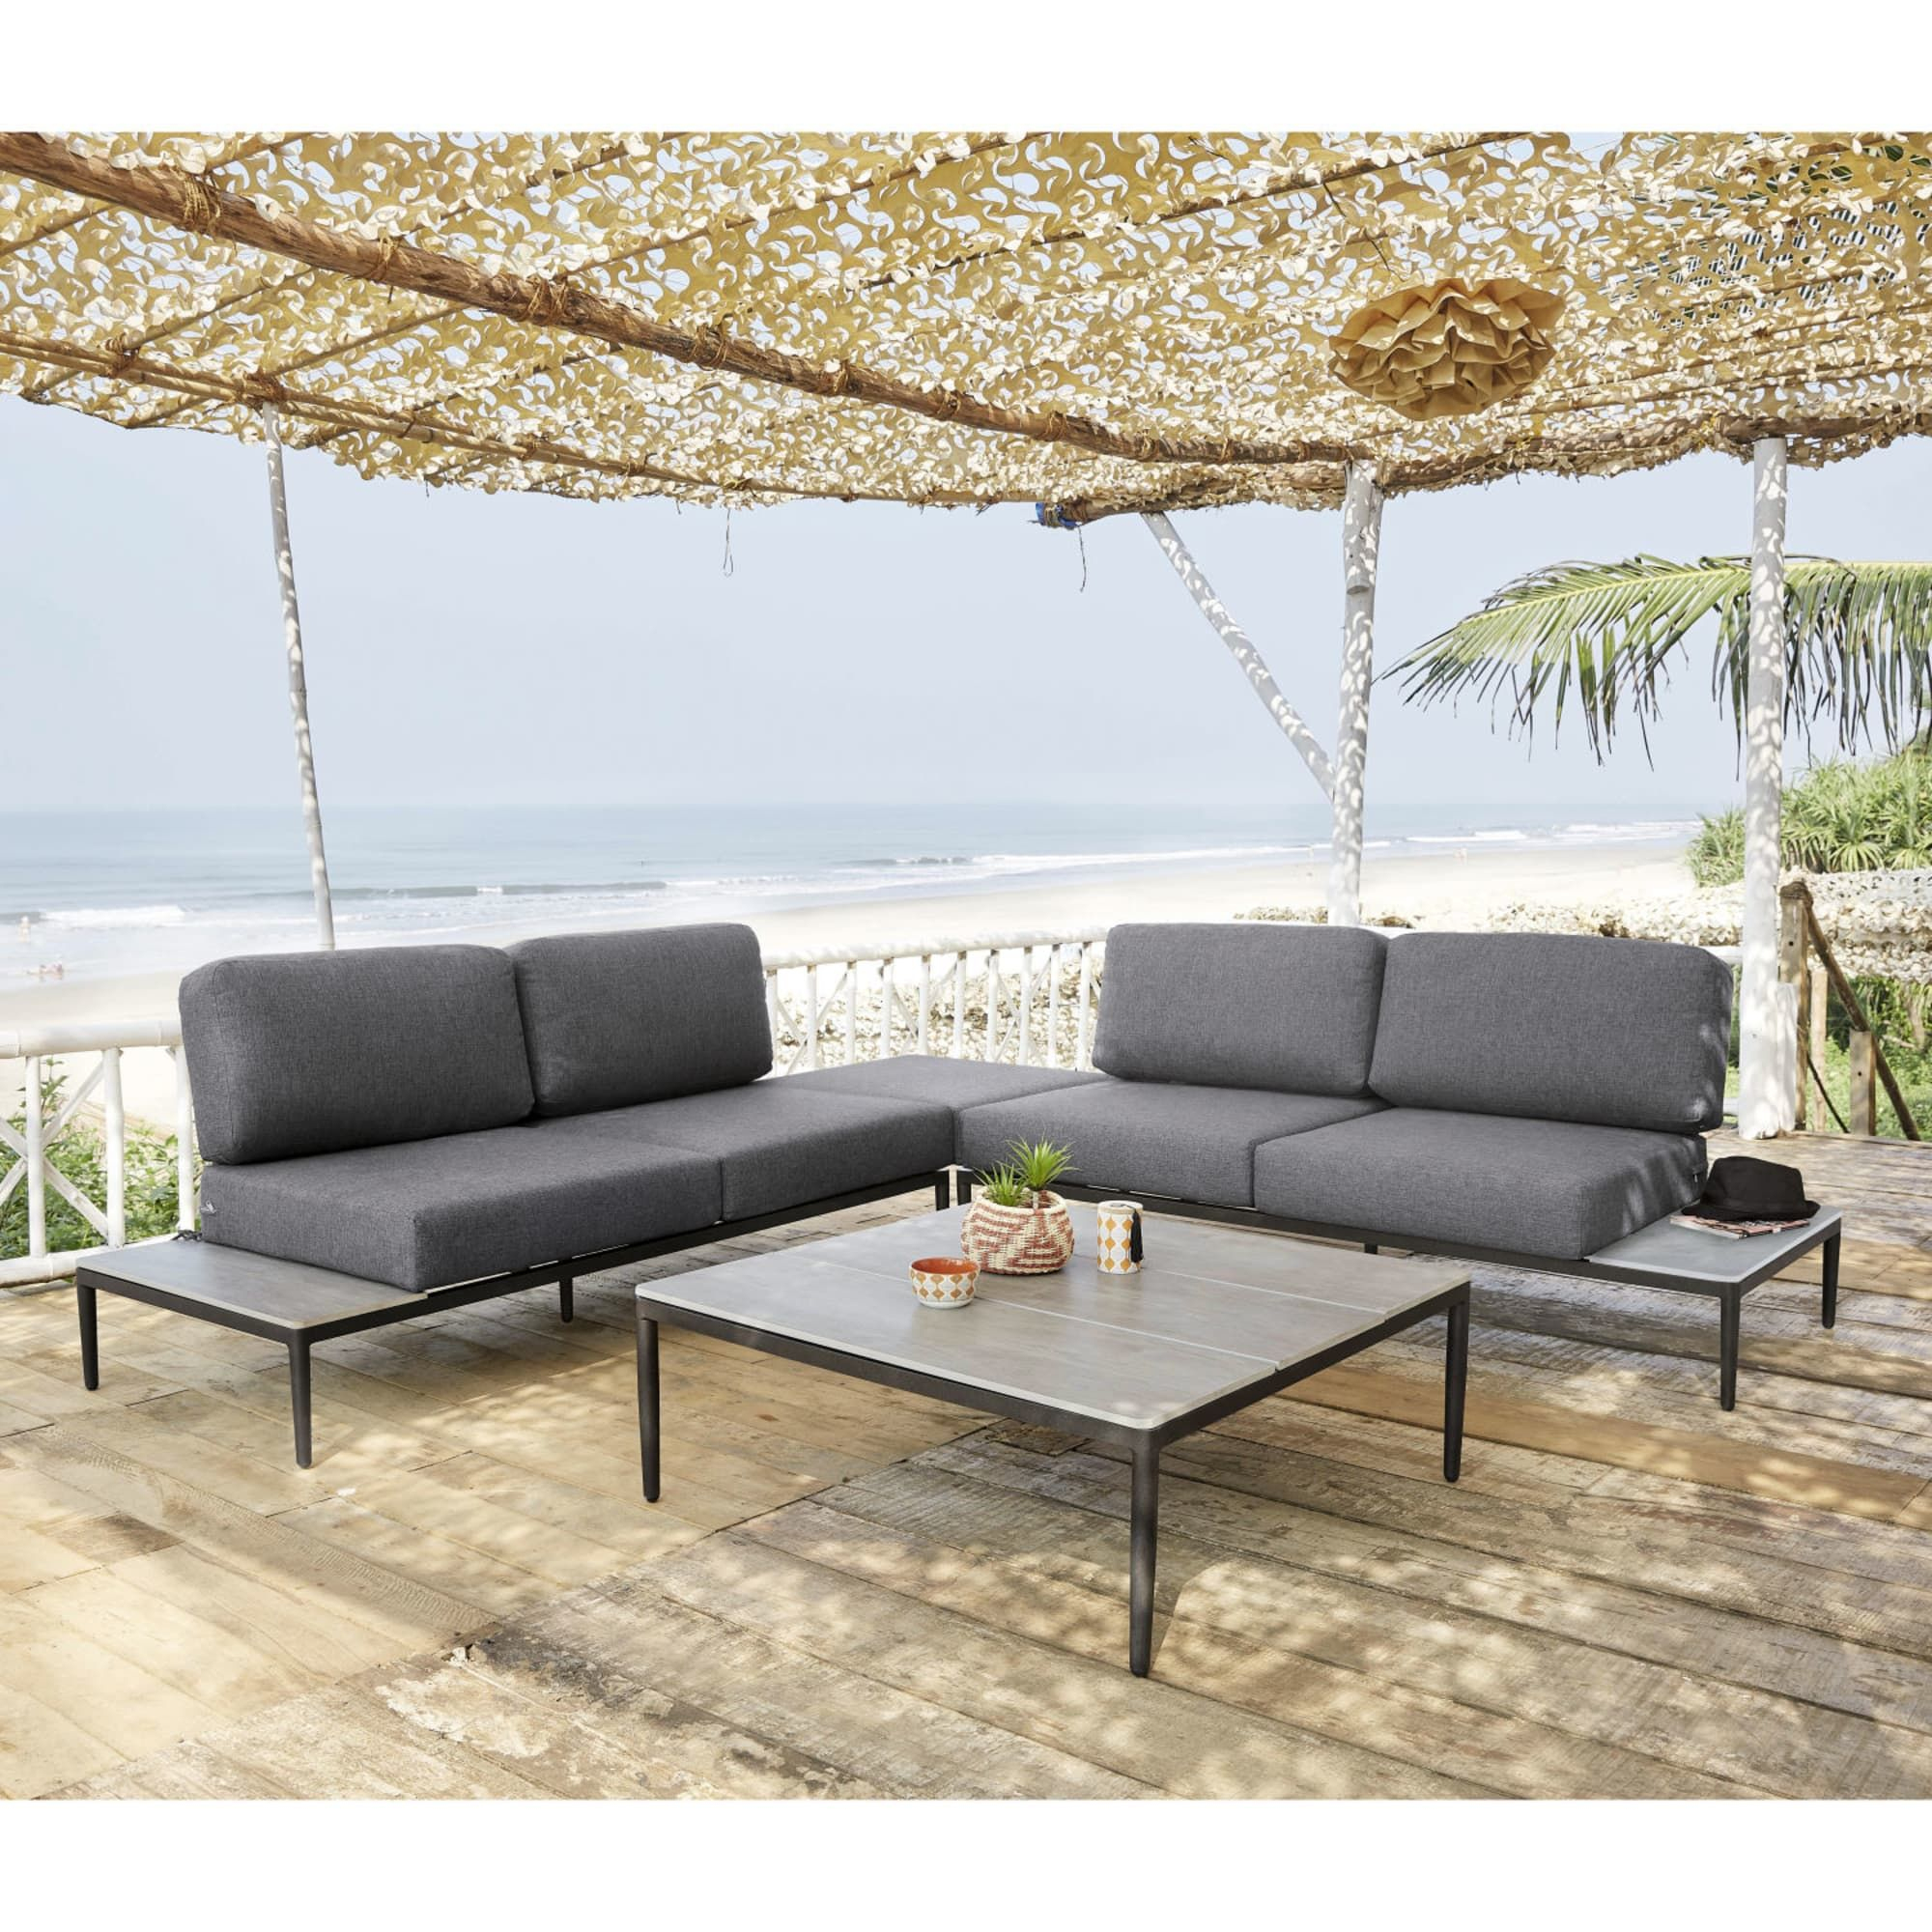 Outdoor Furniture | Aluminum Patio, Outdoor Furniture, Outdoor pour Table De Jardin Auchan